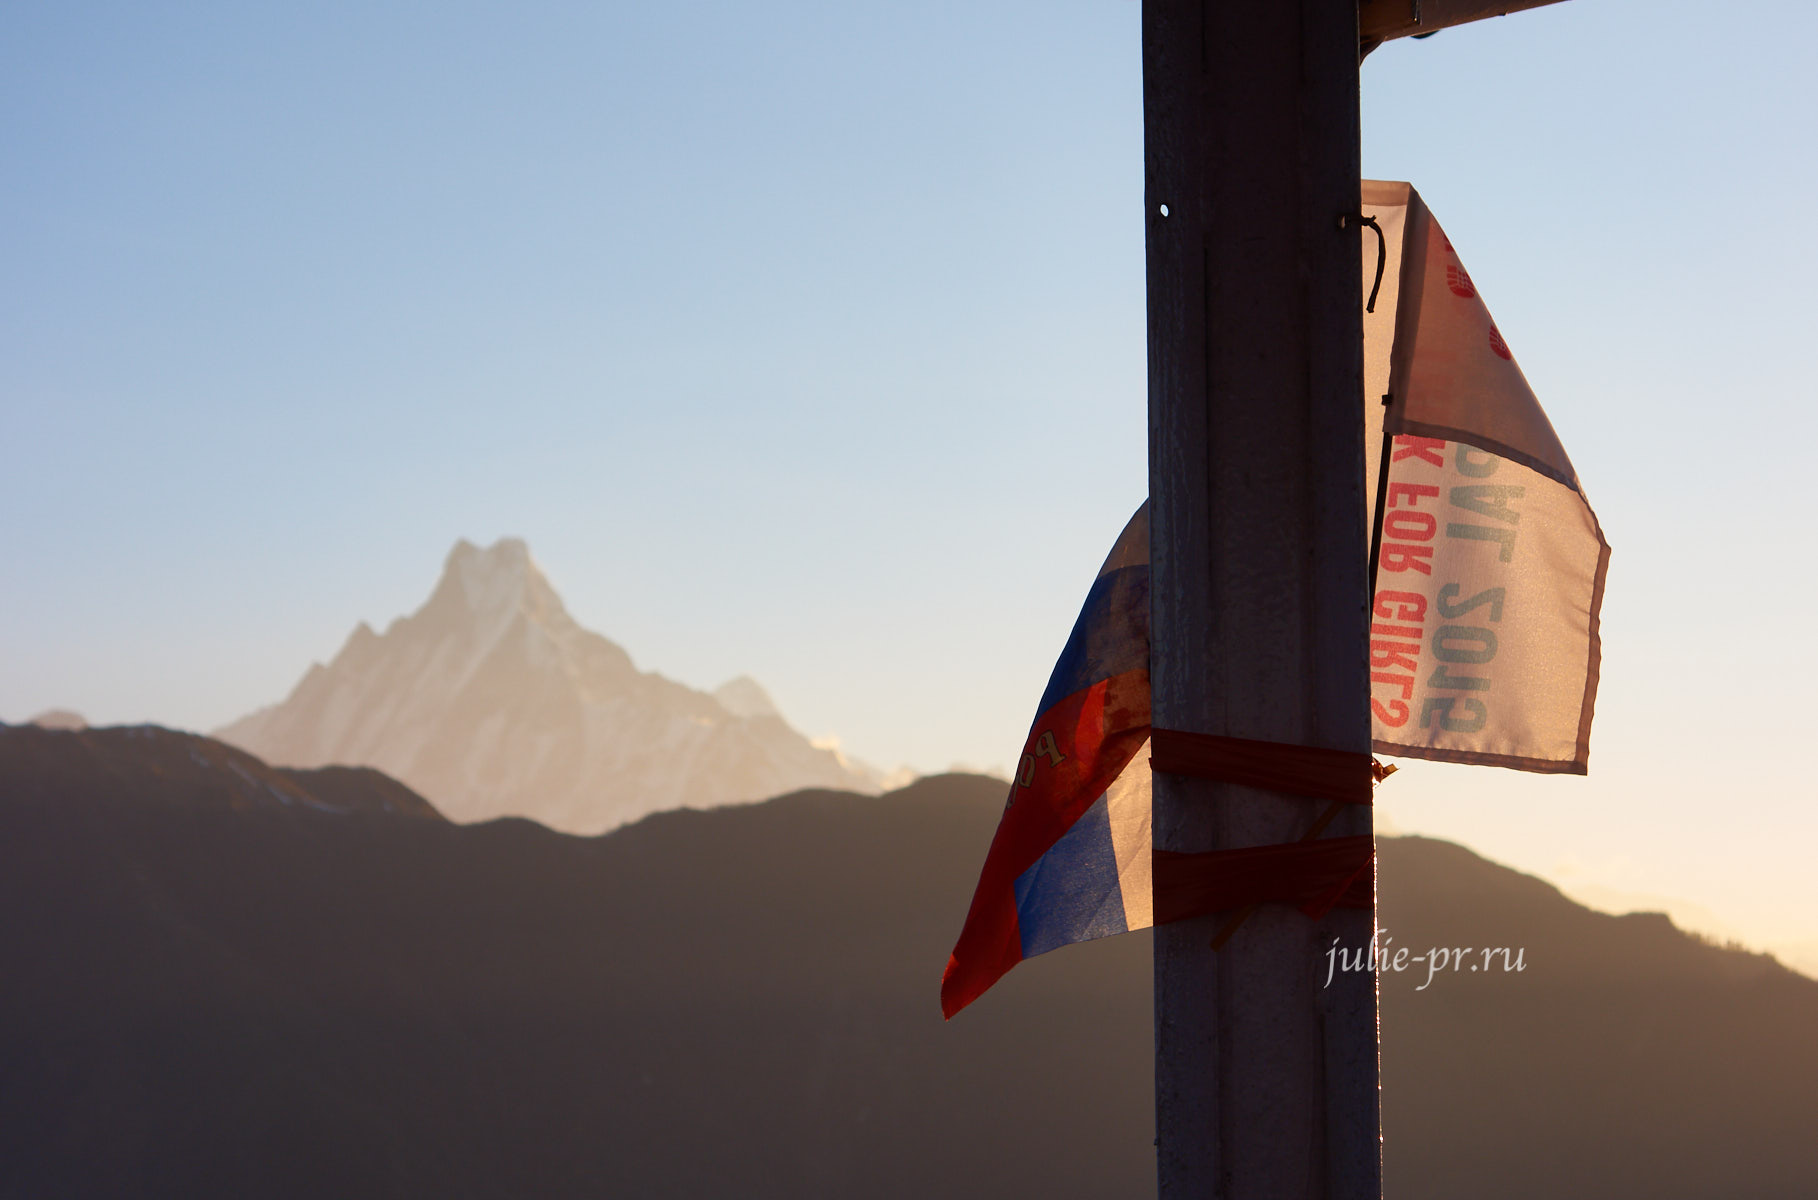 Непал, Пун-Хилл трек, Российский флажок на Пун-Хилле